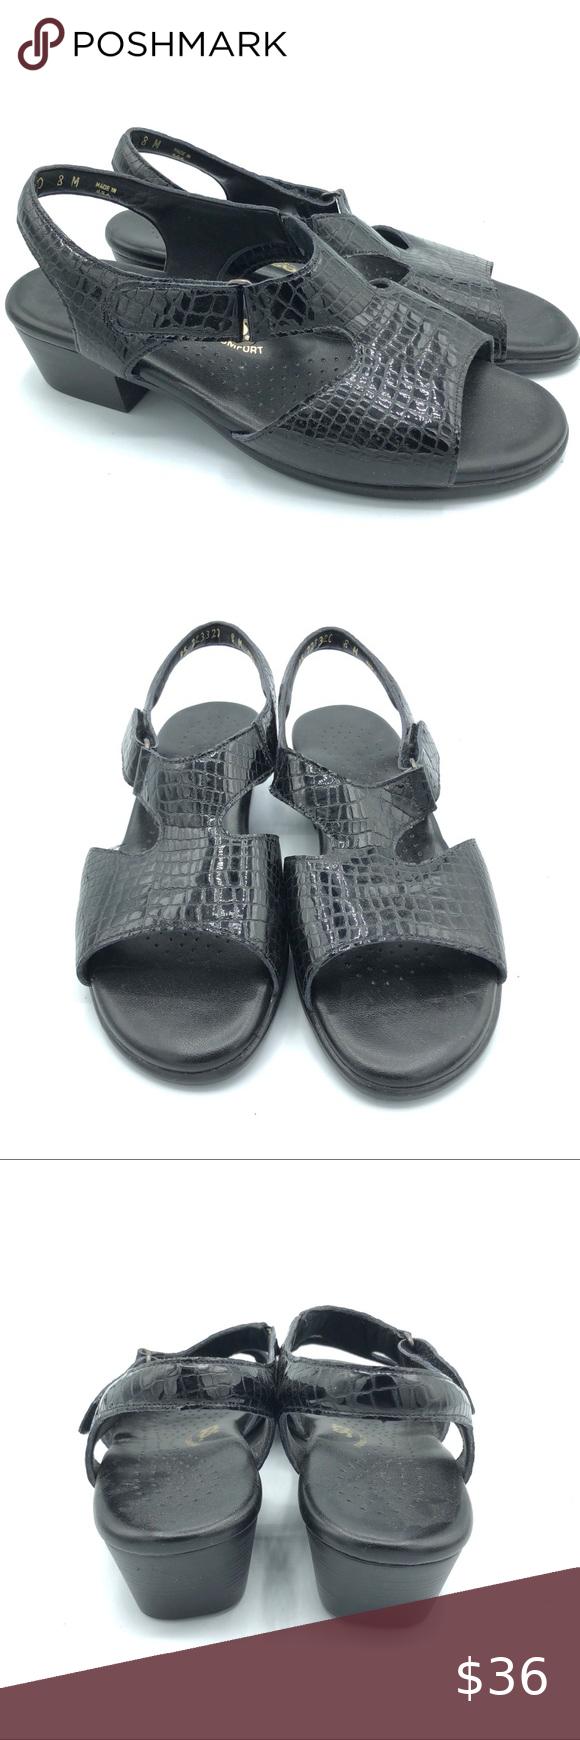 SAS croc Tripad Comfort slingback Sandals A0137 SAS  croc black leather Tripad Comfort slingback Sandals A0137 Size: 8 M Gently used condition SAS Shoes Sandals